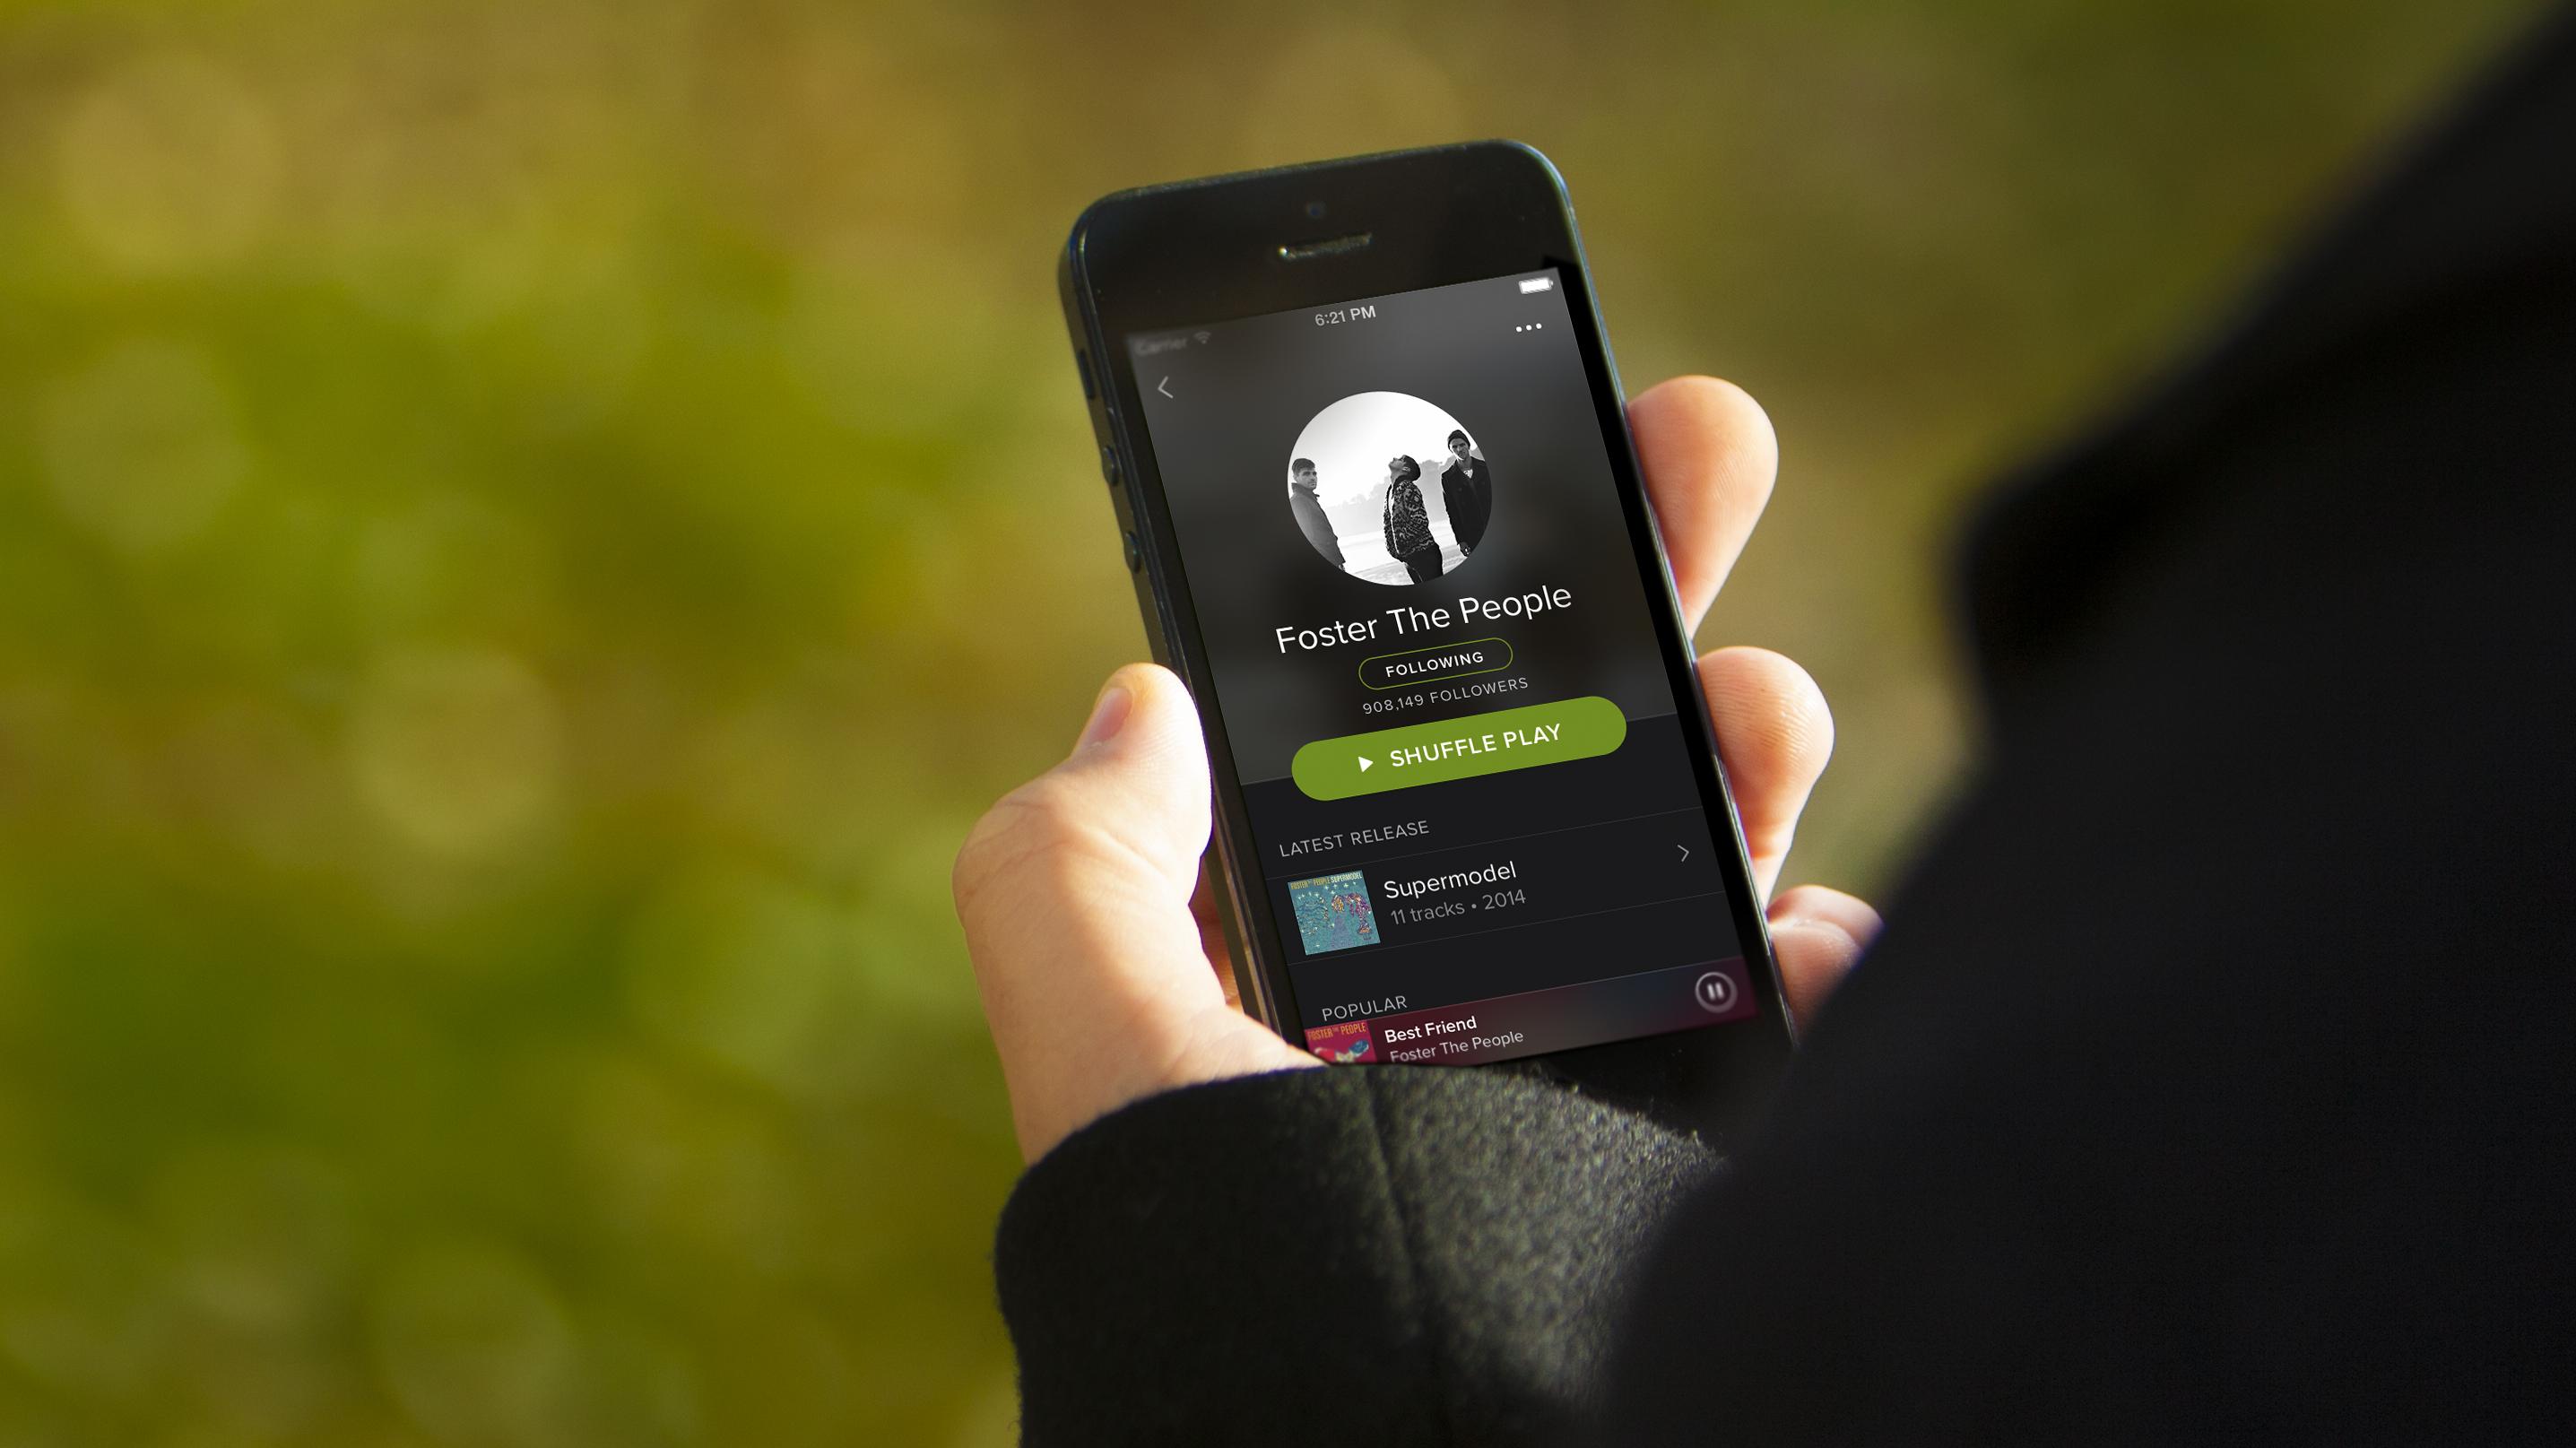 spotify-newlook-iphone-artist-outdoor